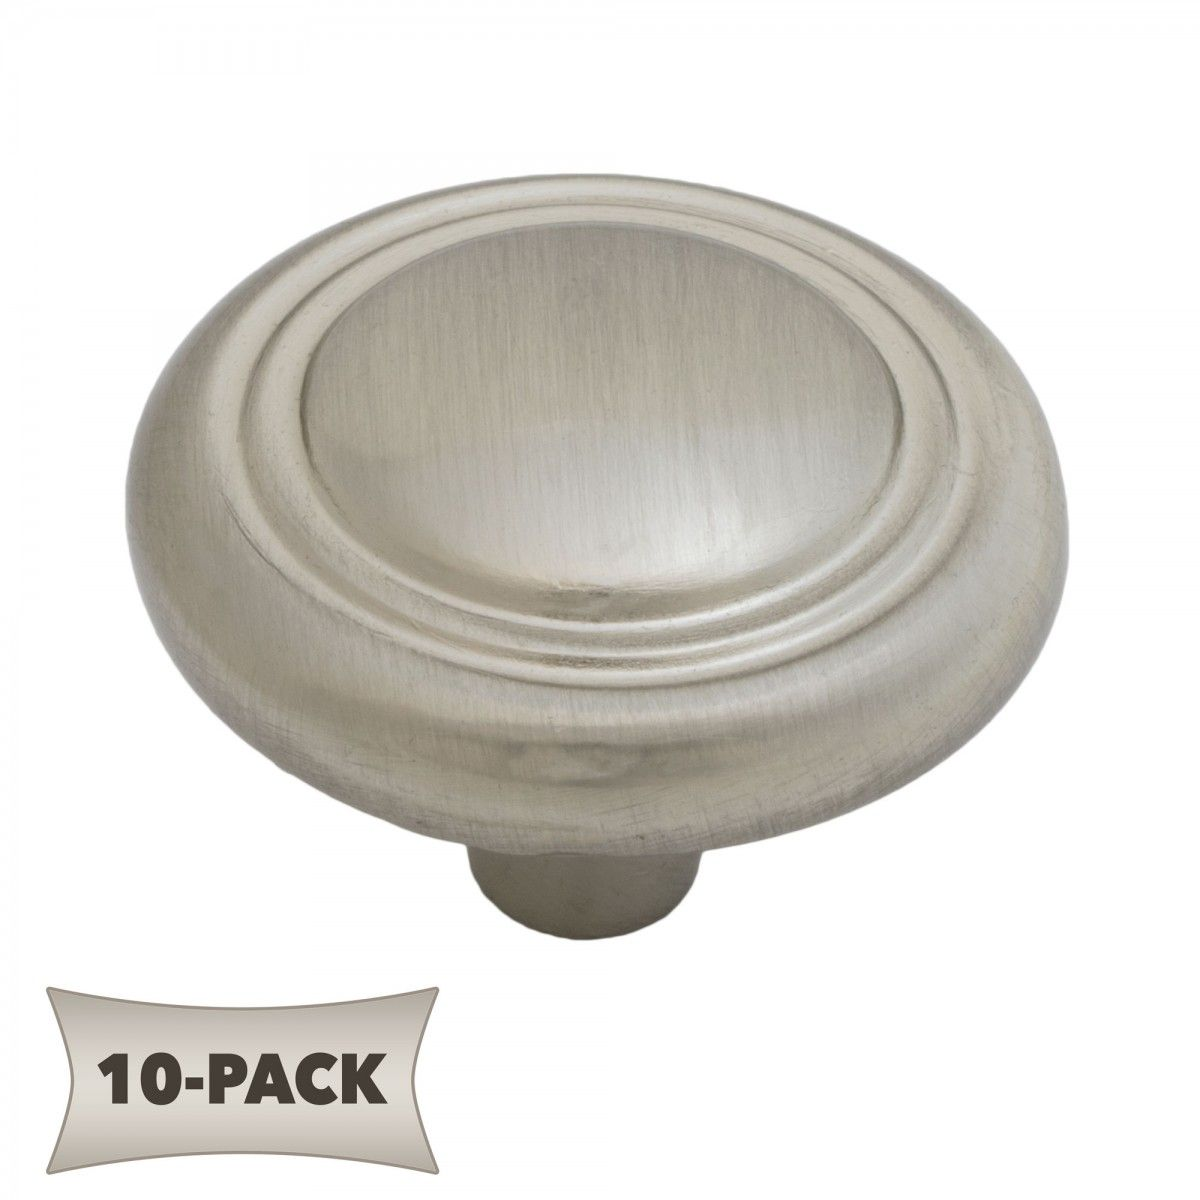 ultra hardware 10 pack button rimmed round kitchen cabinet hardware mushroom knob 1 1 4 inch satin nickel ultra hardware 10 pack button rimmed round kitchen cabinet      rh   pinterest com